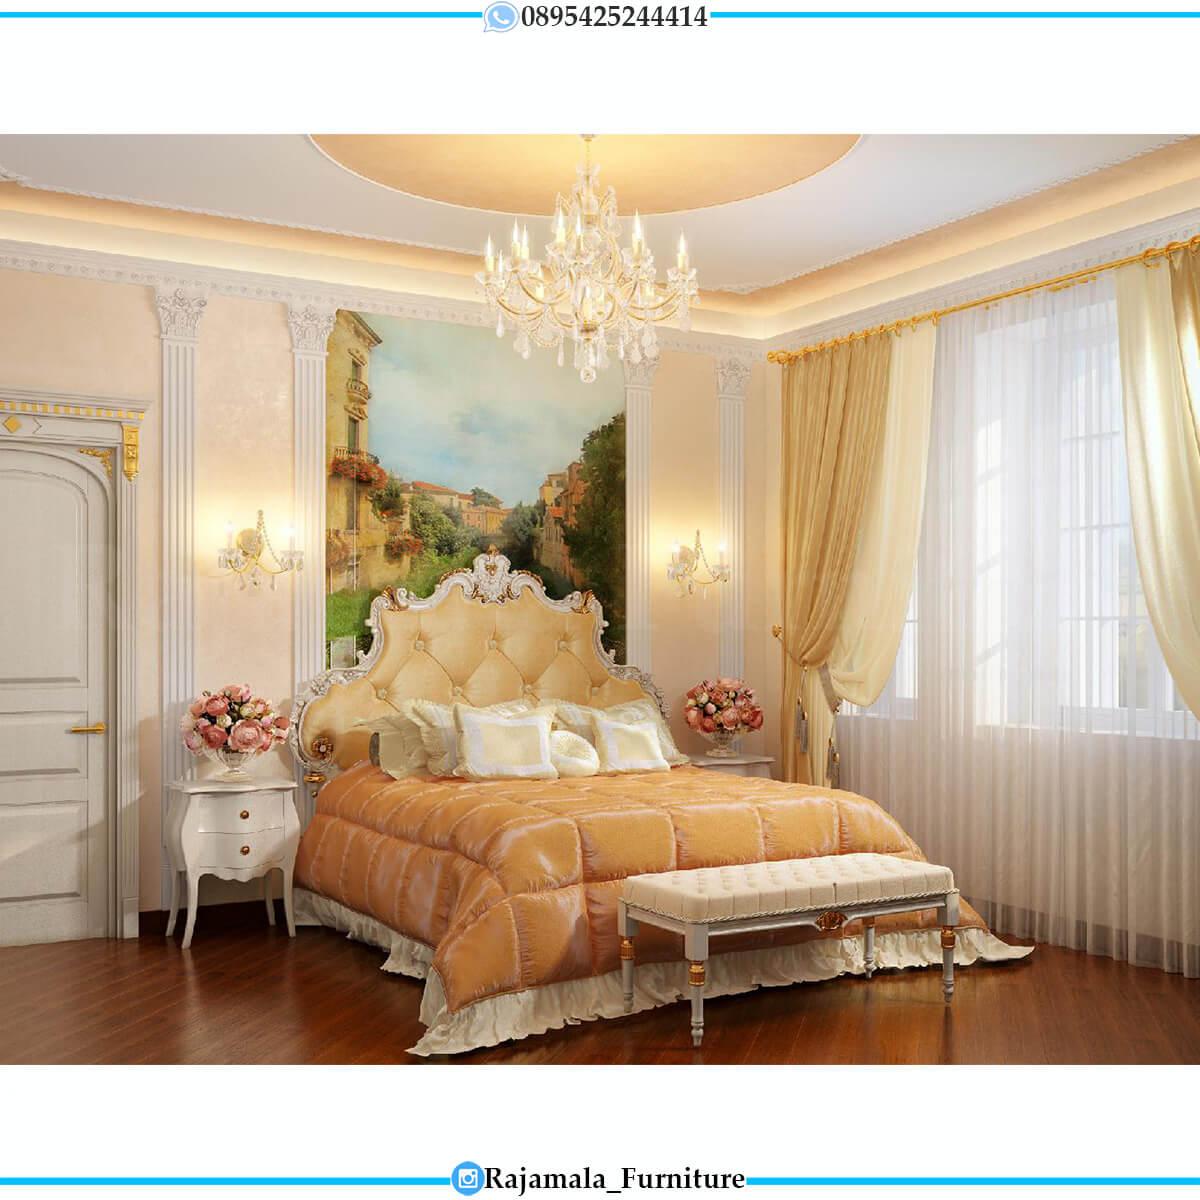 Dipan Mewah Terbaru Luxury Bedroom Sets Classic Carving RM-0653